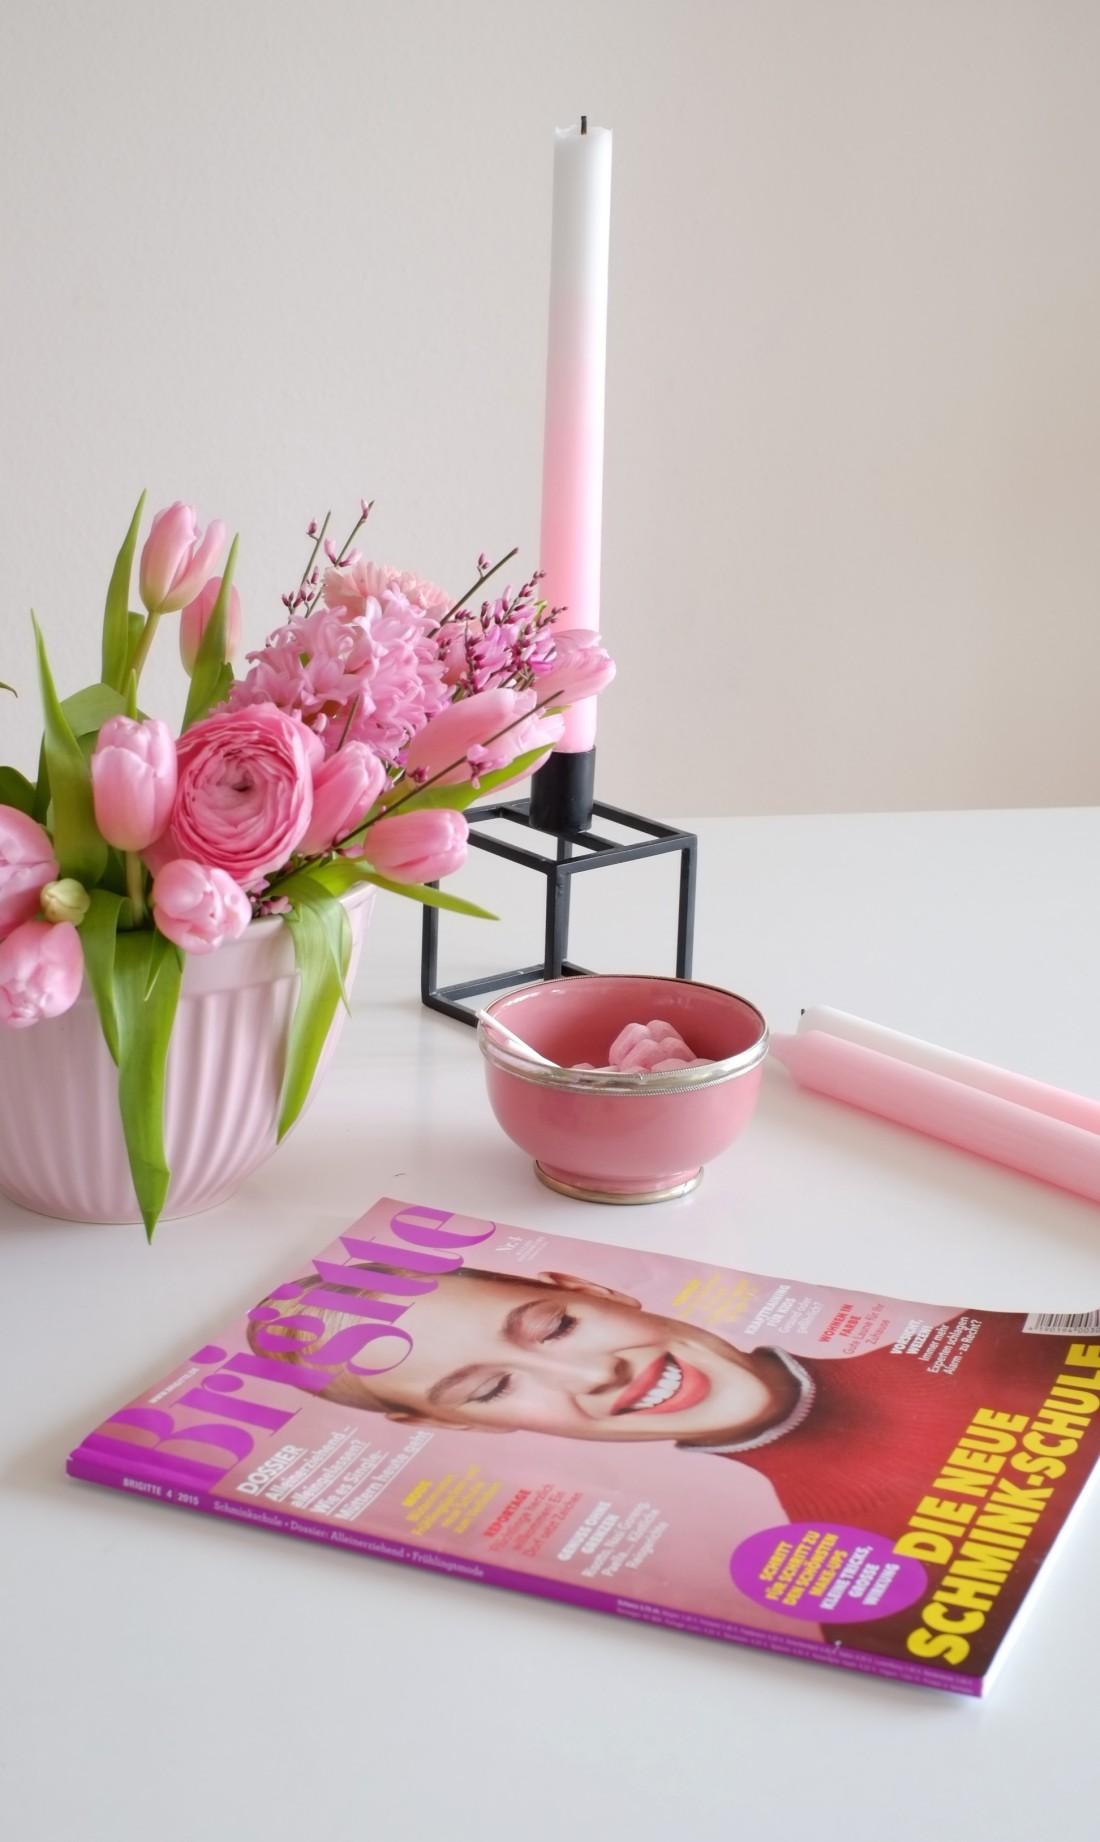 grau oder rosa pastell bei herr und frau krauss auf dem blog herr und frau krauss shop und blog. Black Bedroom Furniture Sets. Home Design Ideas